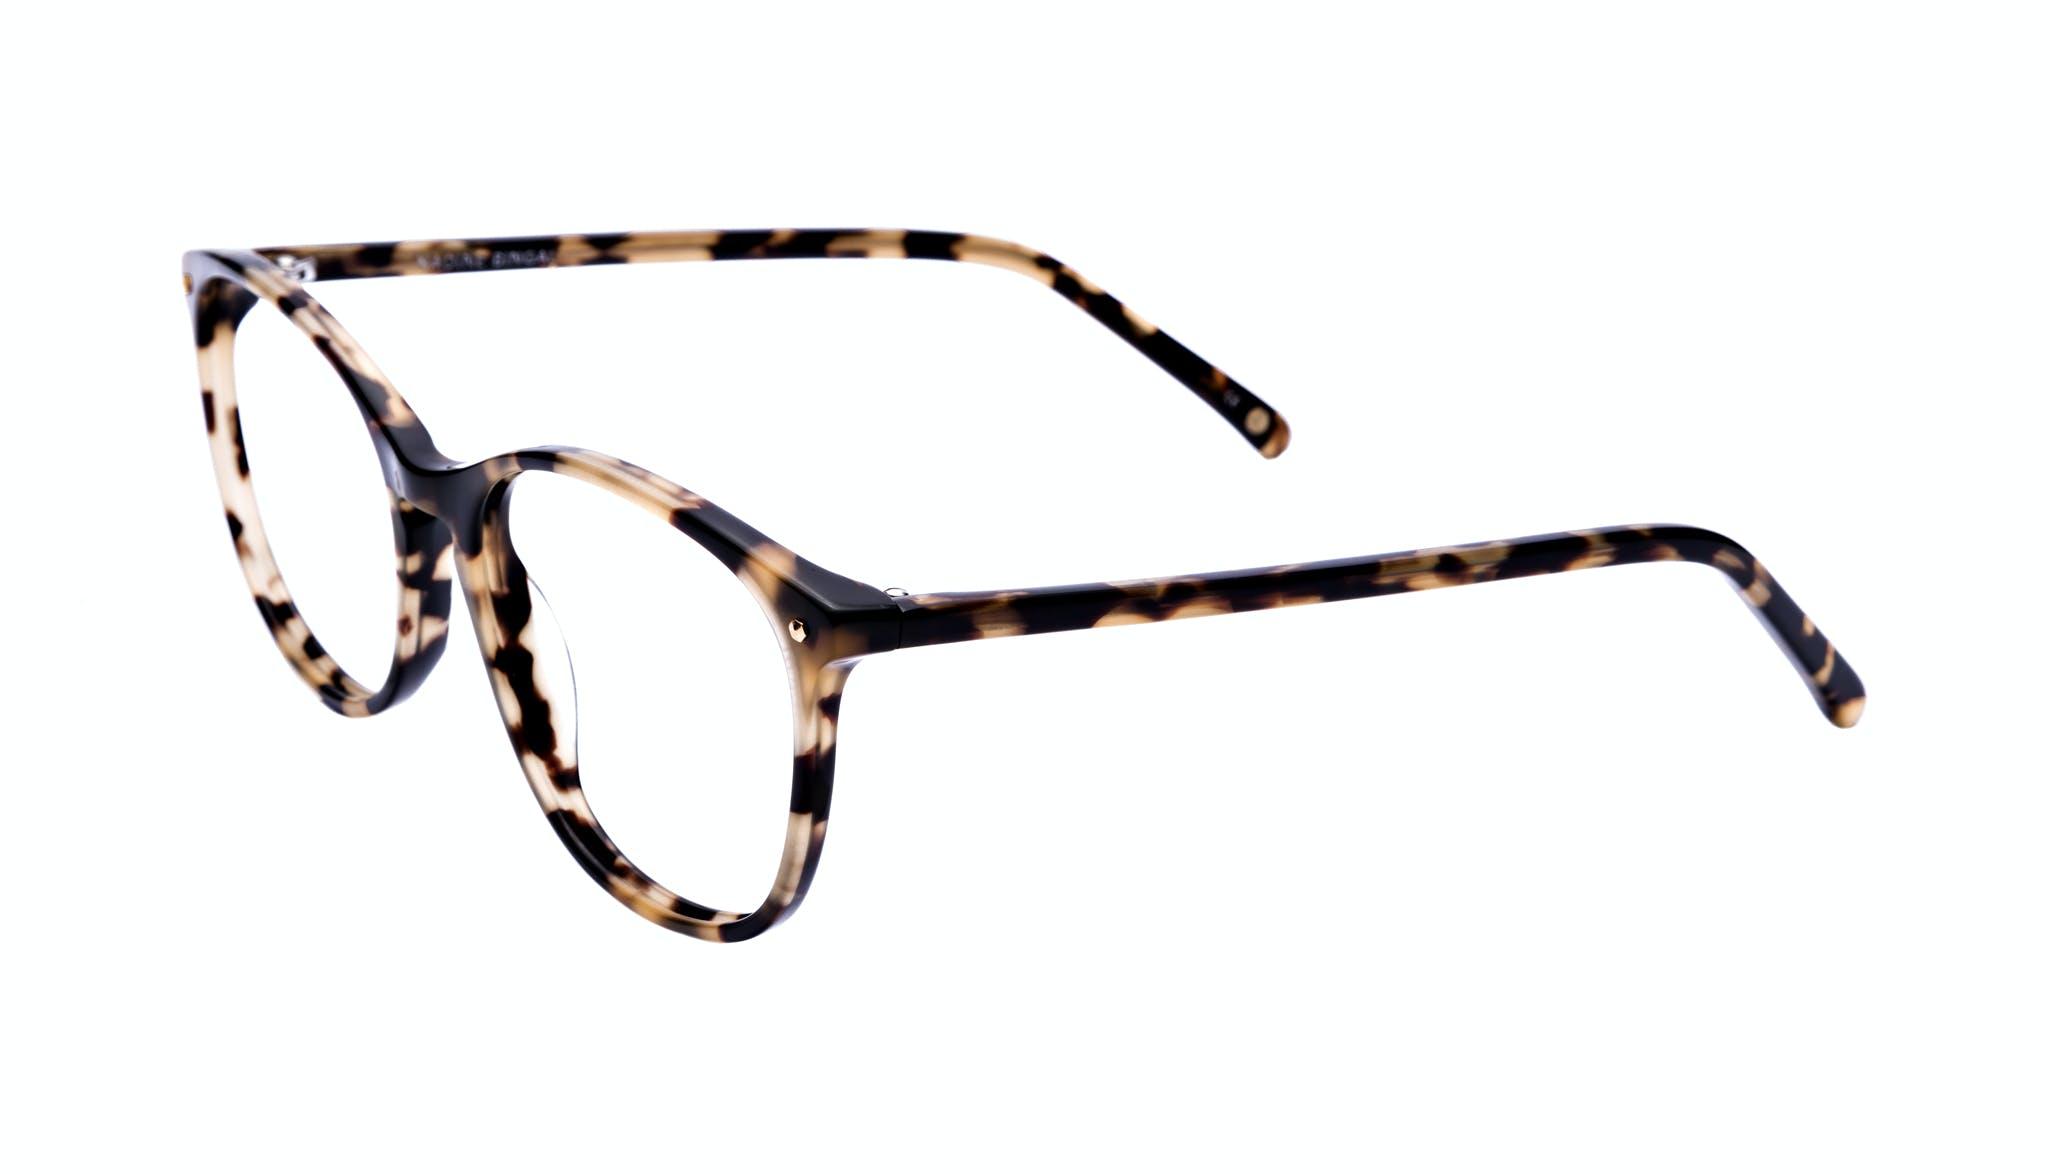 Affordable Fashion Glasses Rectangle Square Round Eyeglasses Women Nadine Bingal Tilt